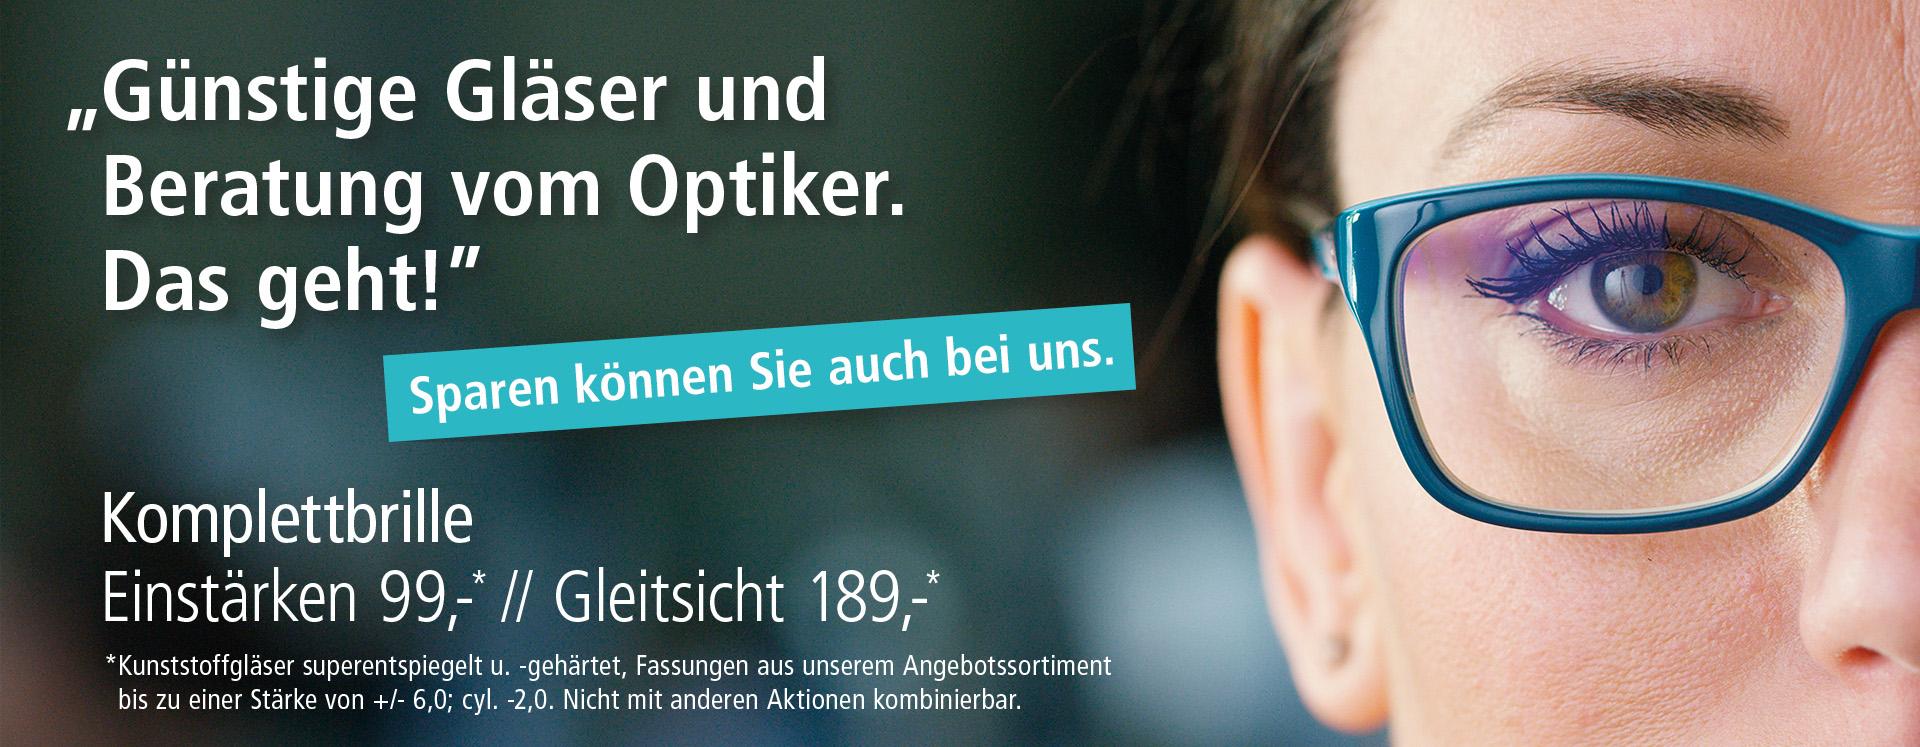 11352-Slider-Optik-Hehn-1920x747.jpg